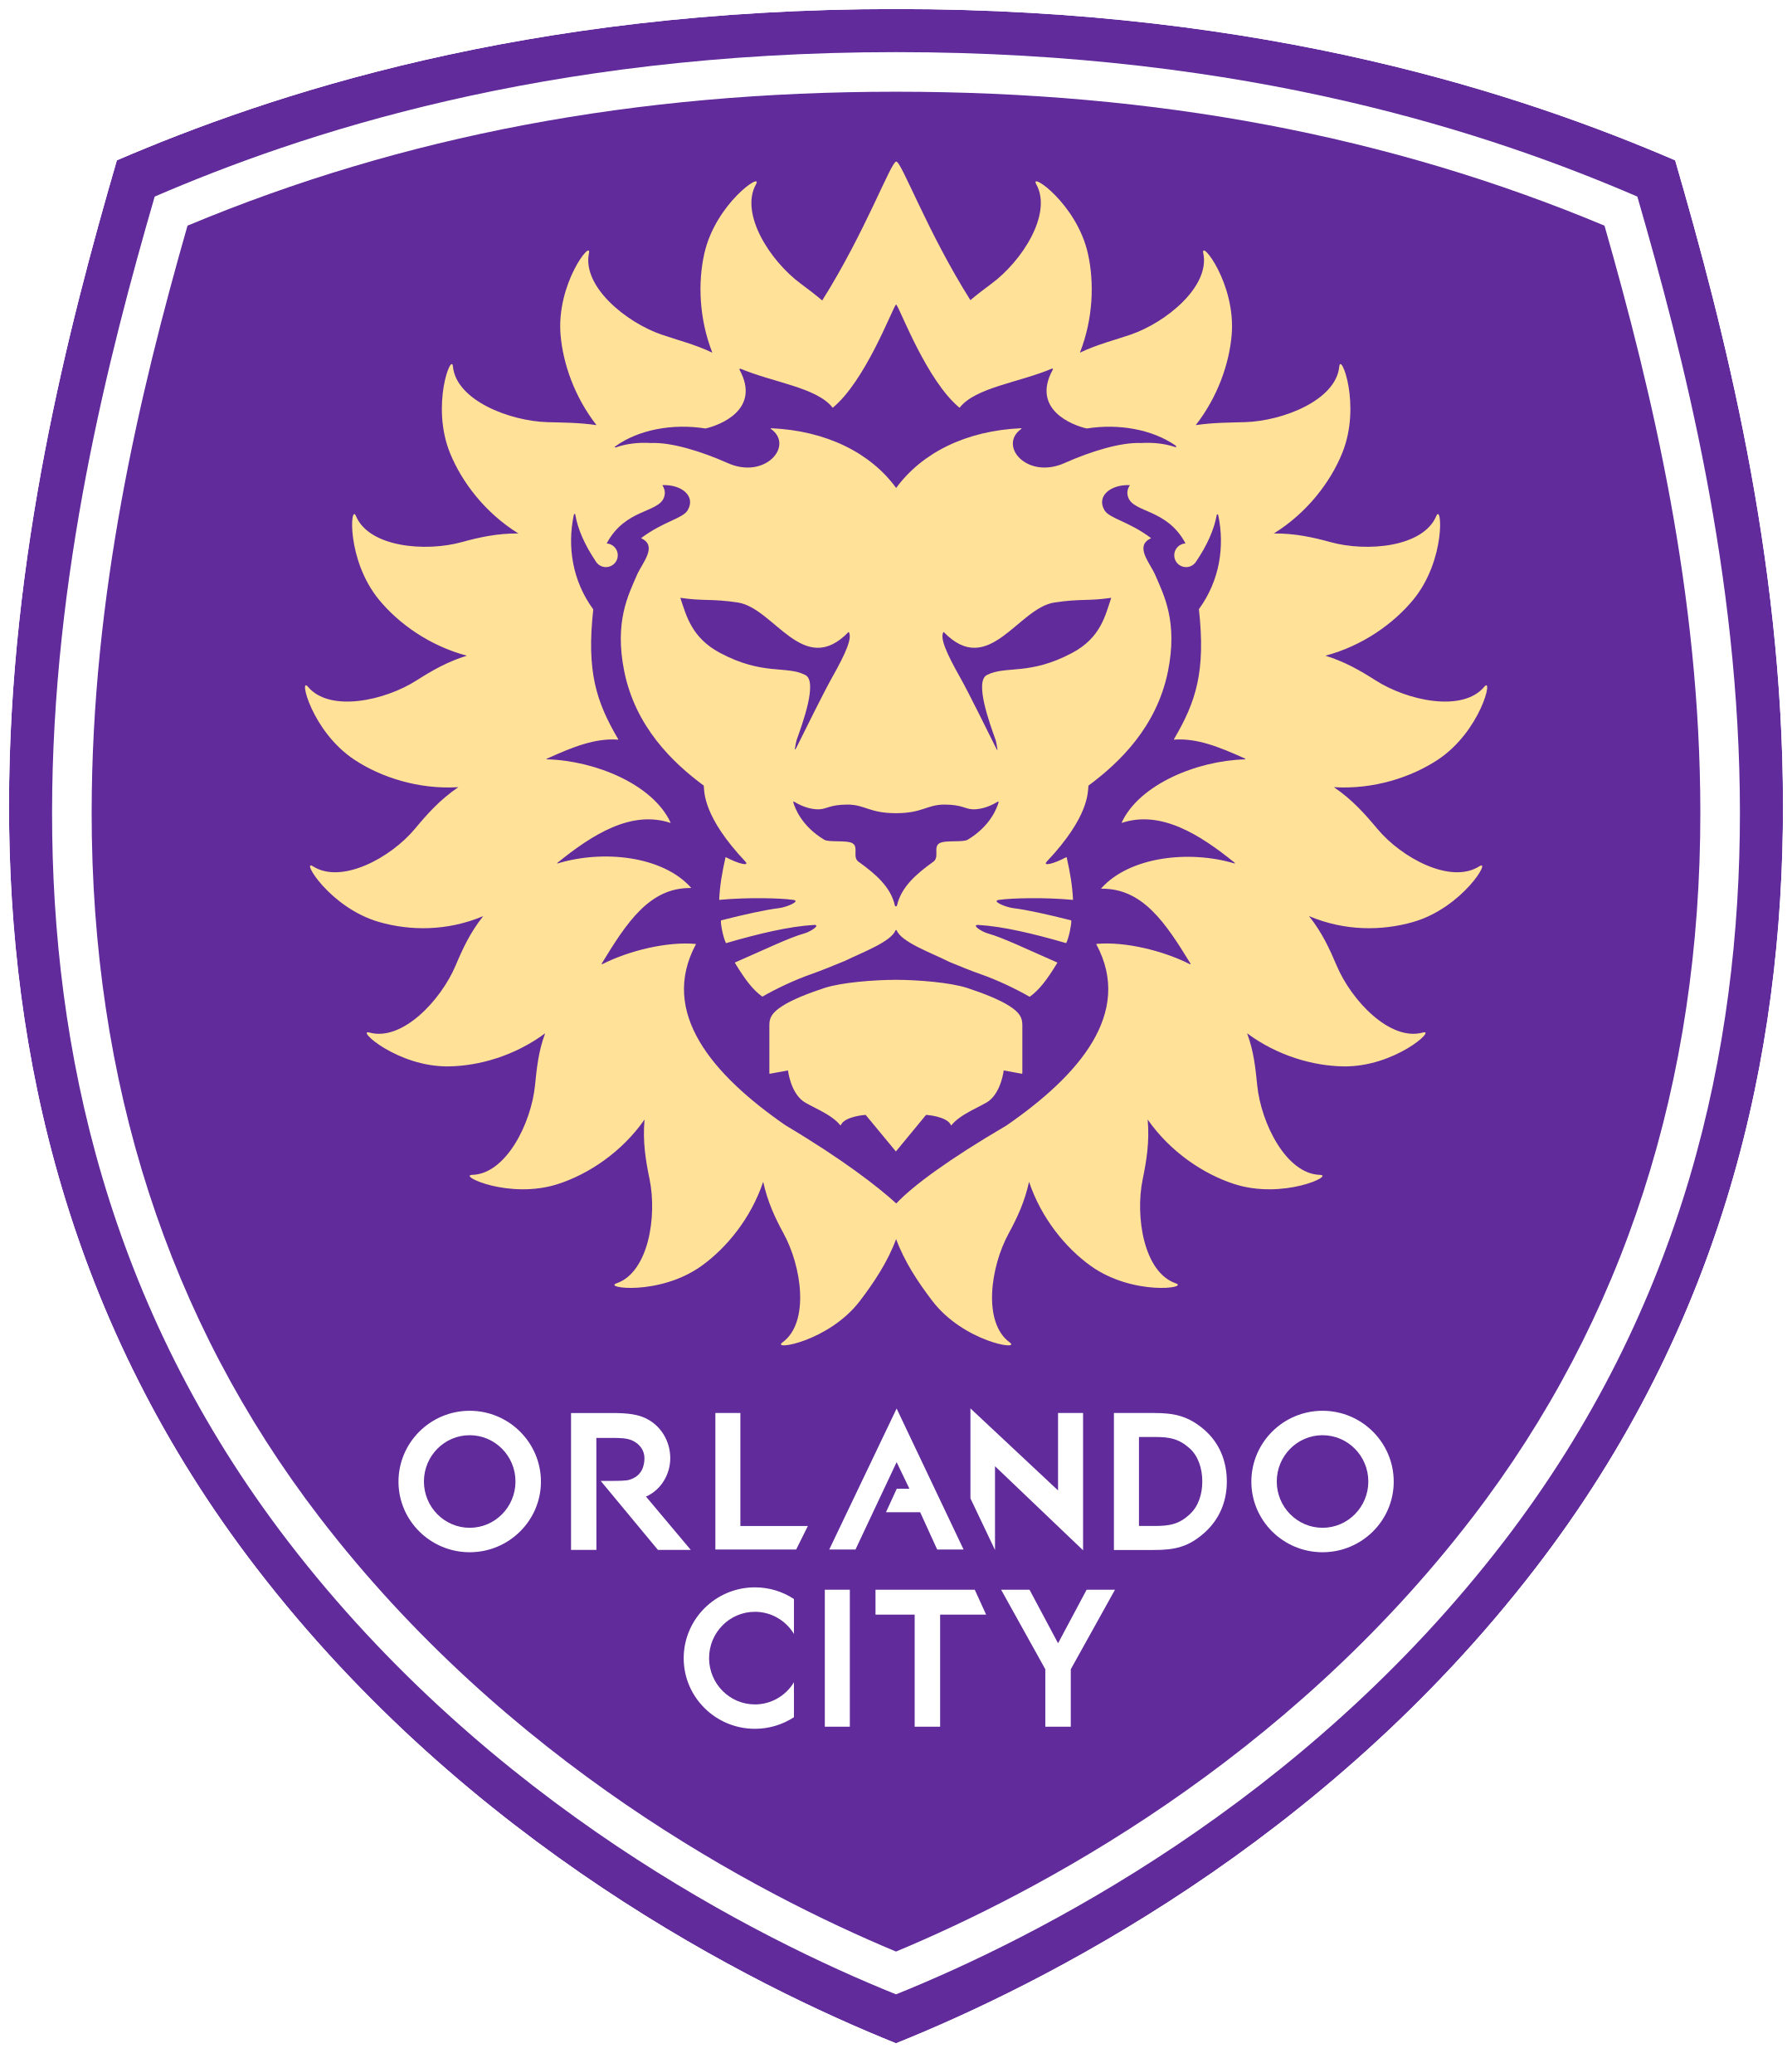 orlando city sc logo 1 - Orlando City SC Logo